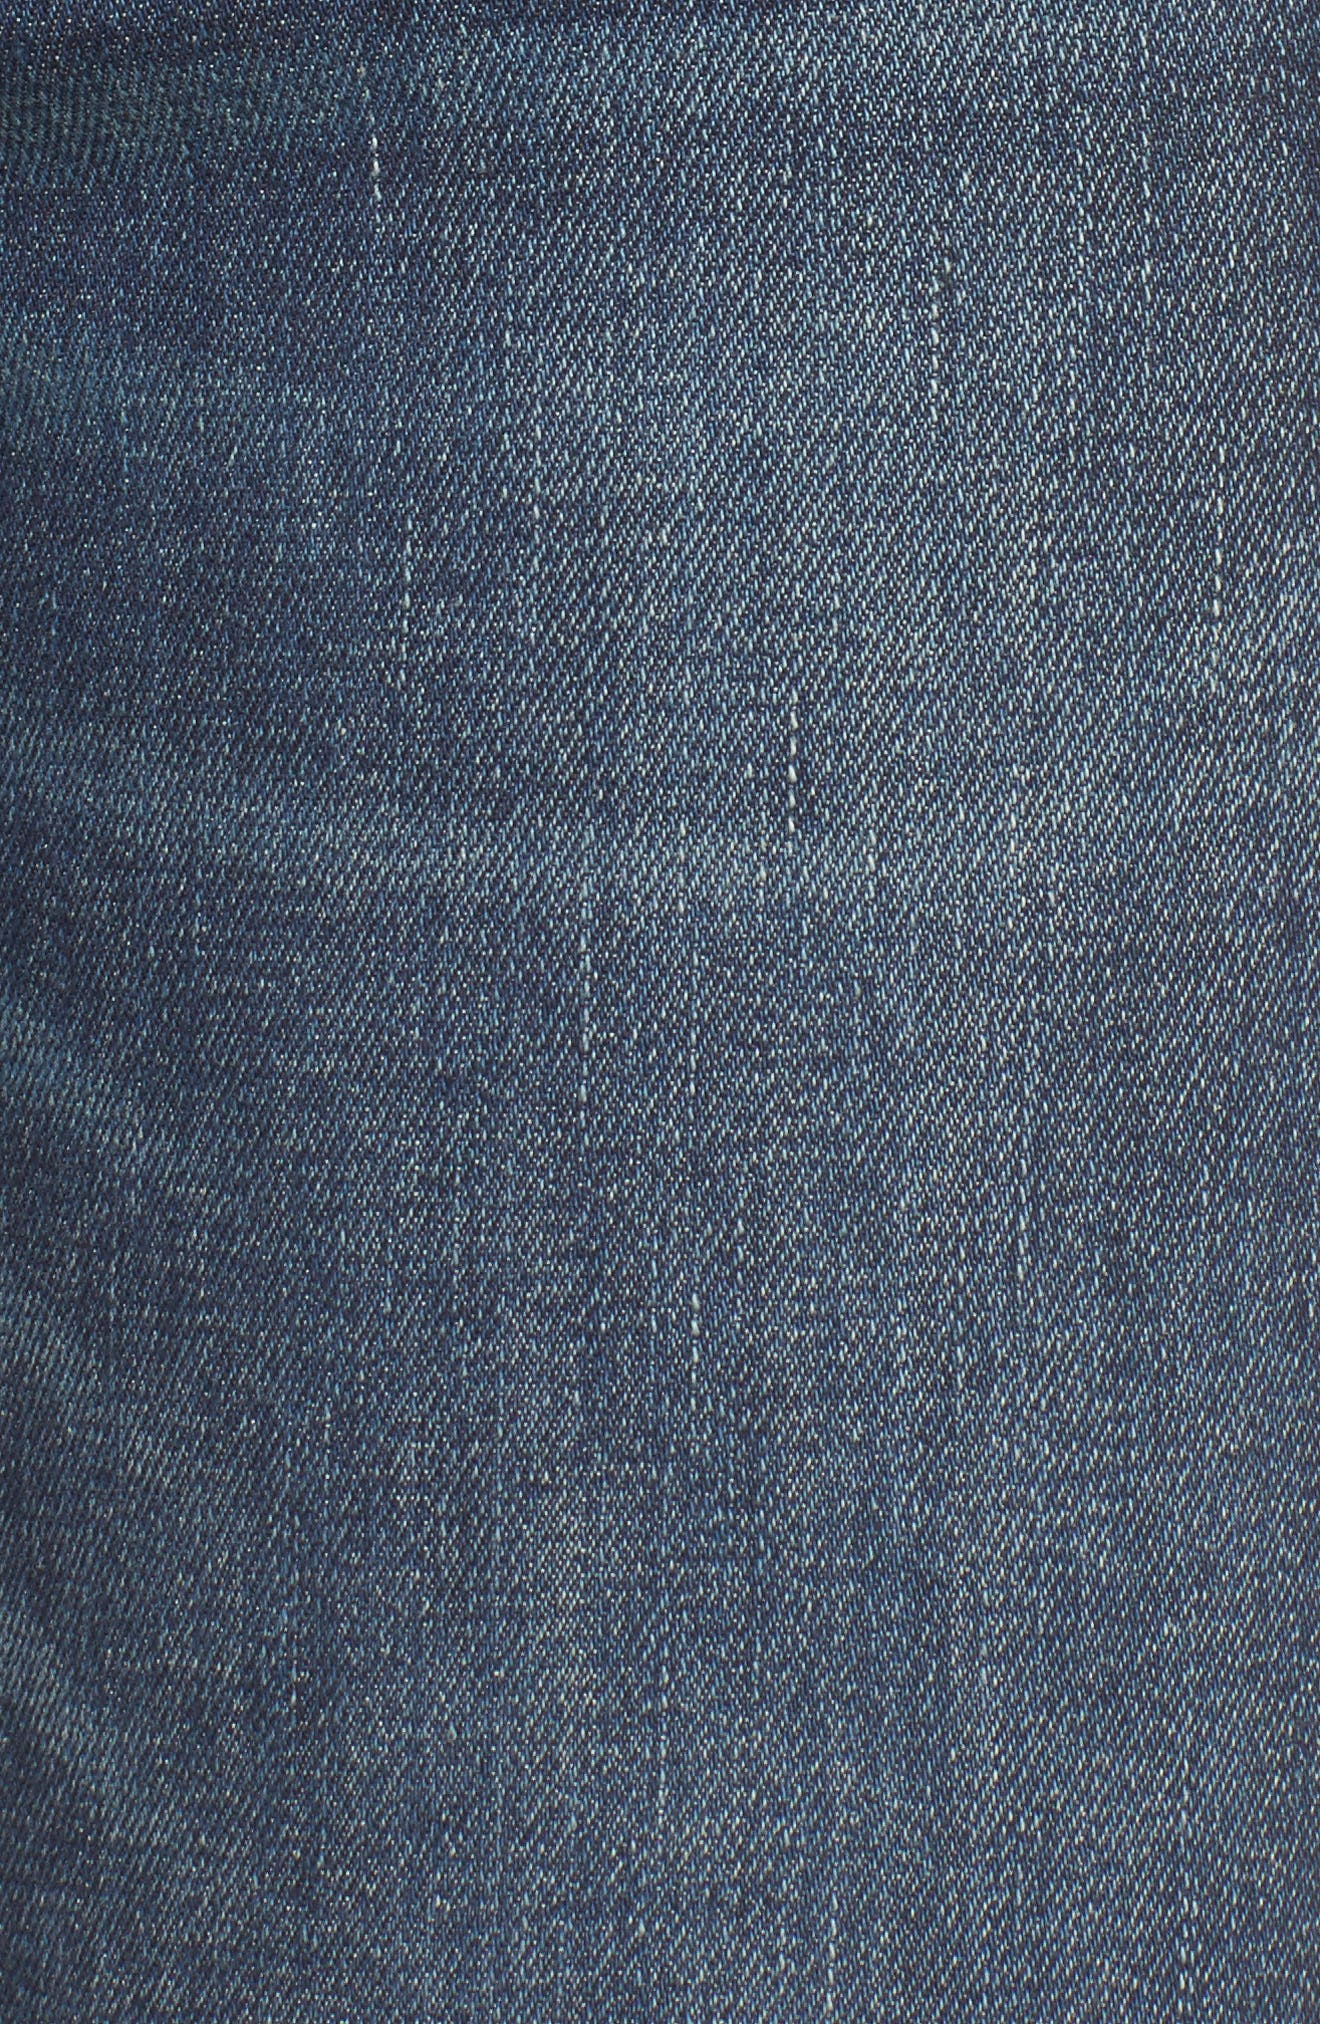 Alternate Image 5  - AGOLDE Sophie High Waist Skinny Jeans